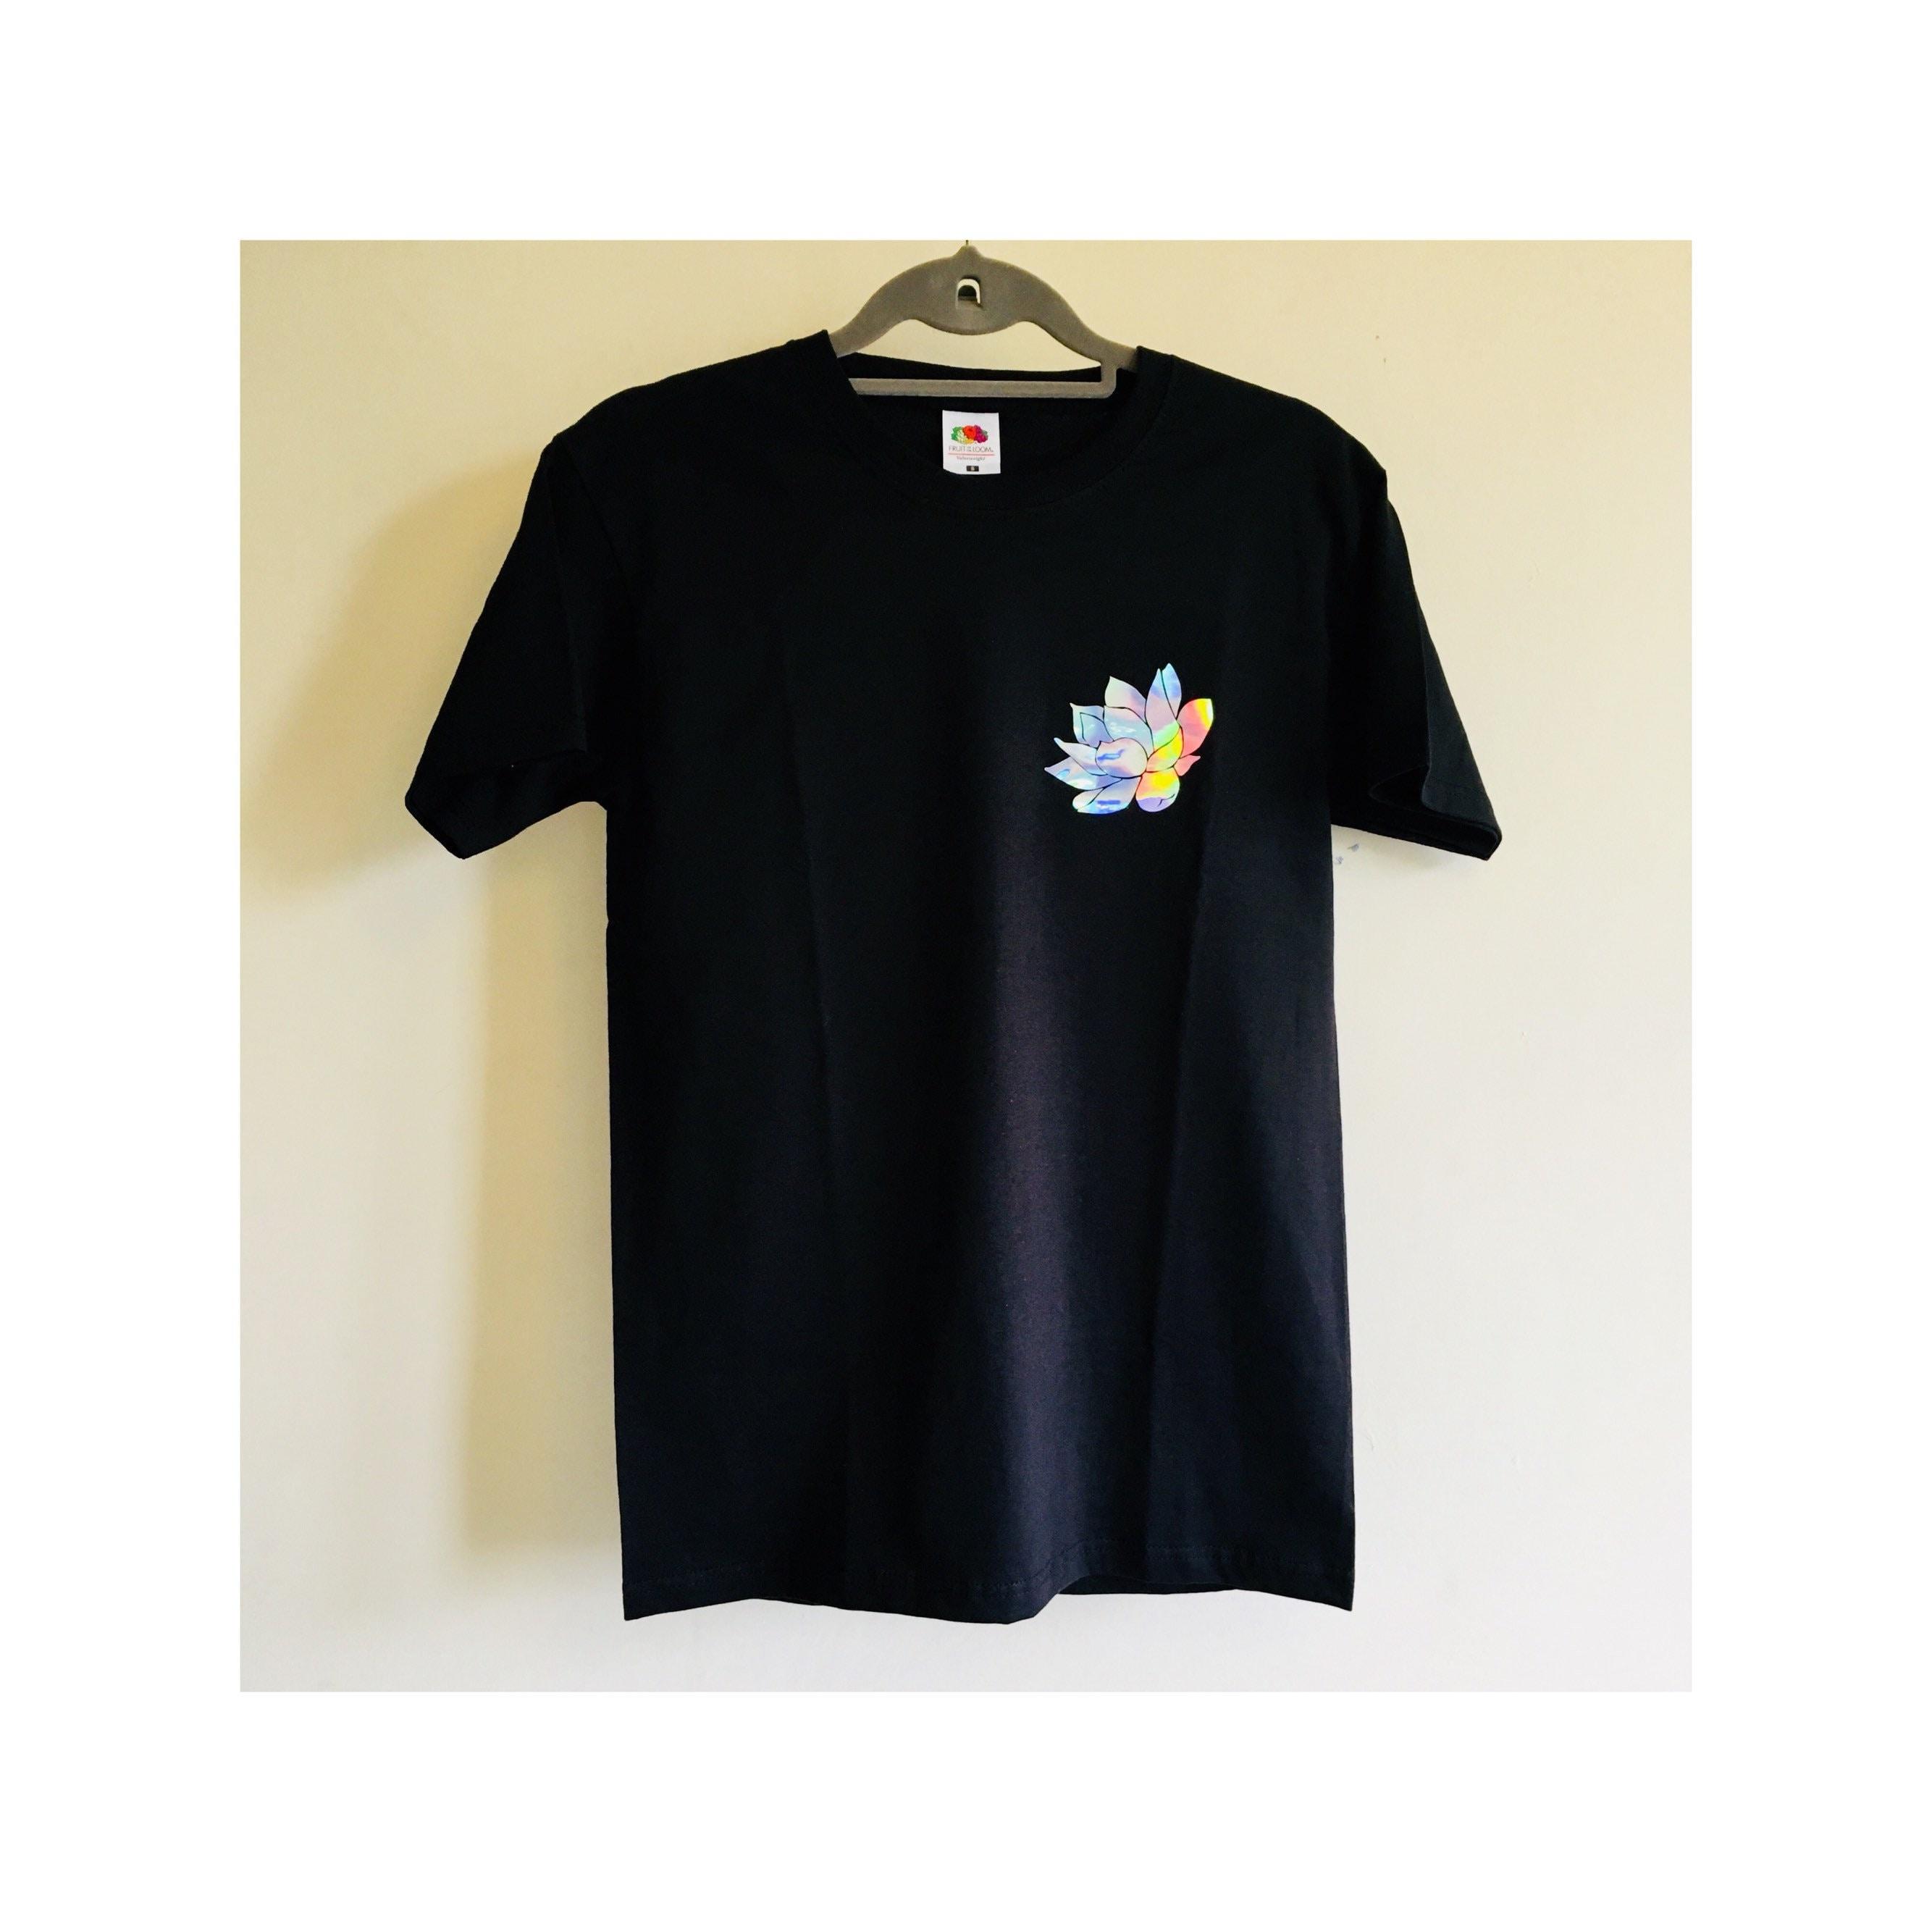 Black t shirt with holographic lotus flower print izmirmasajfo